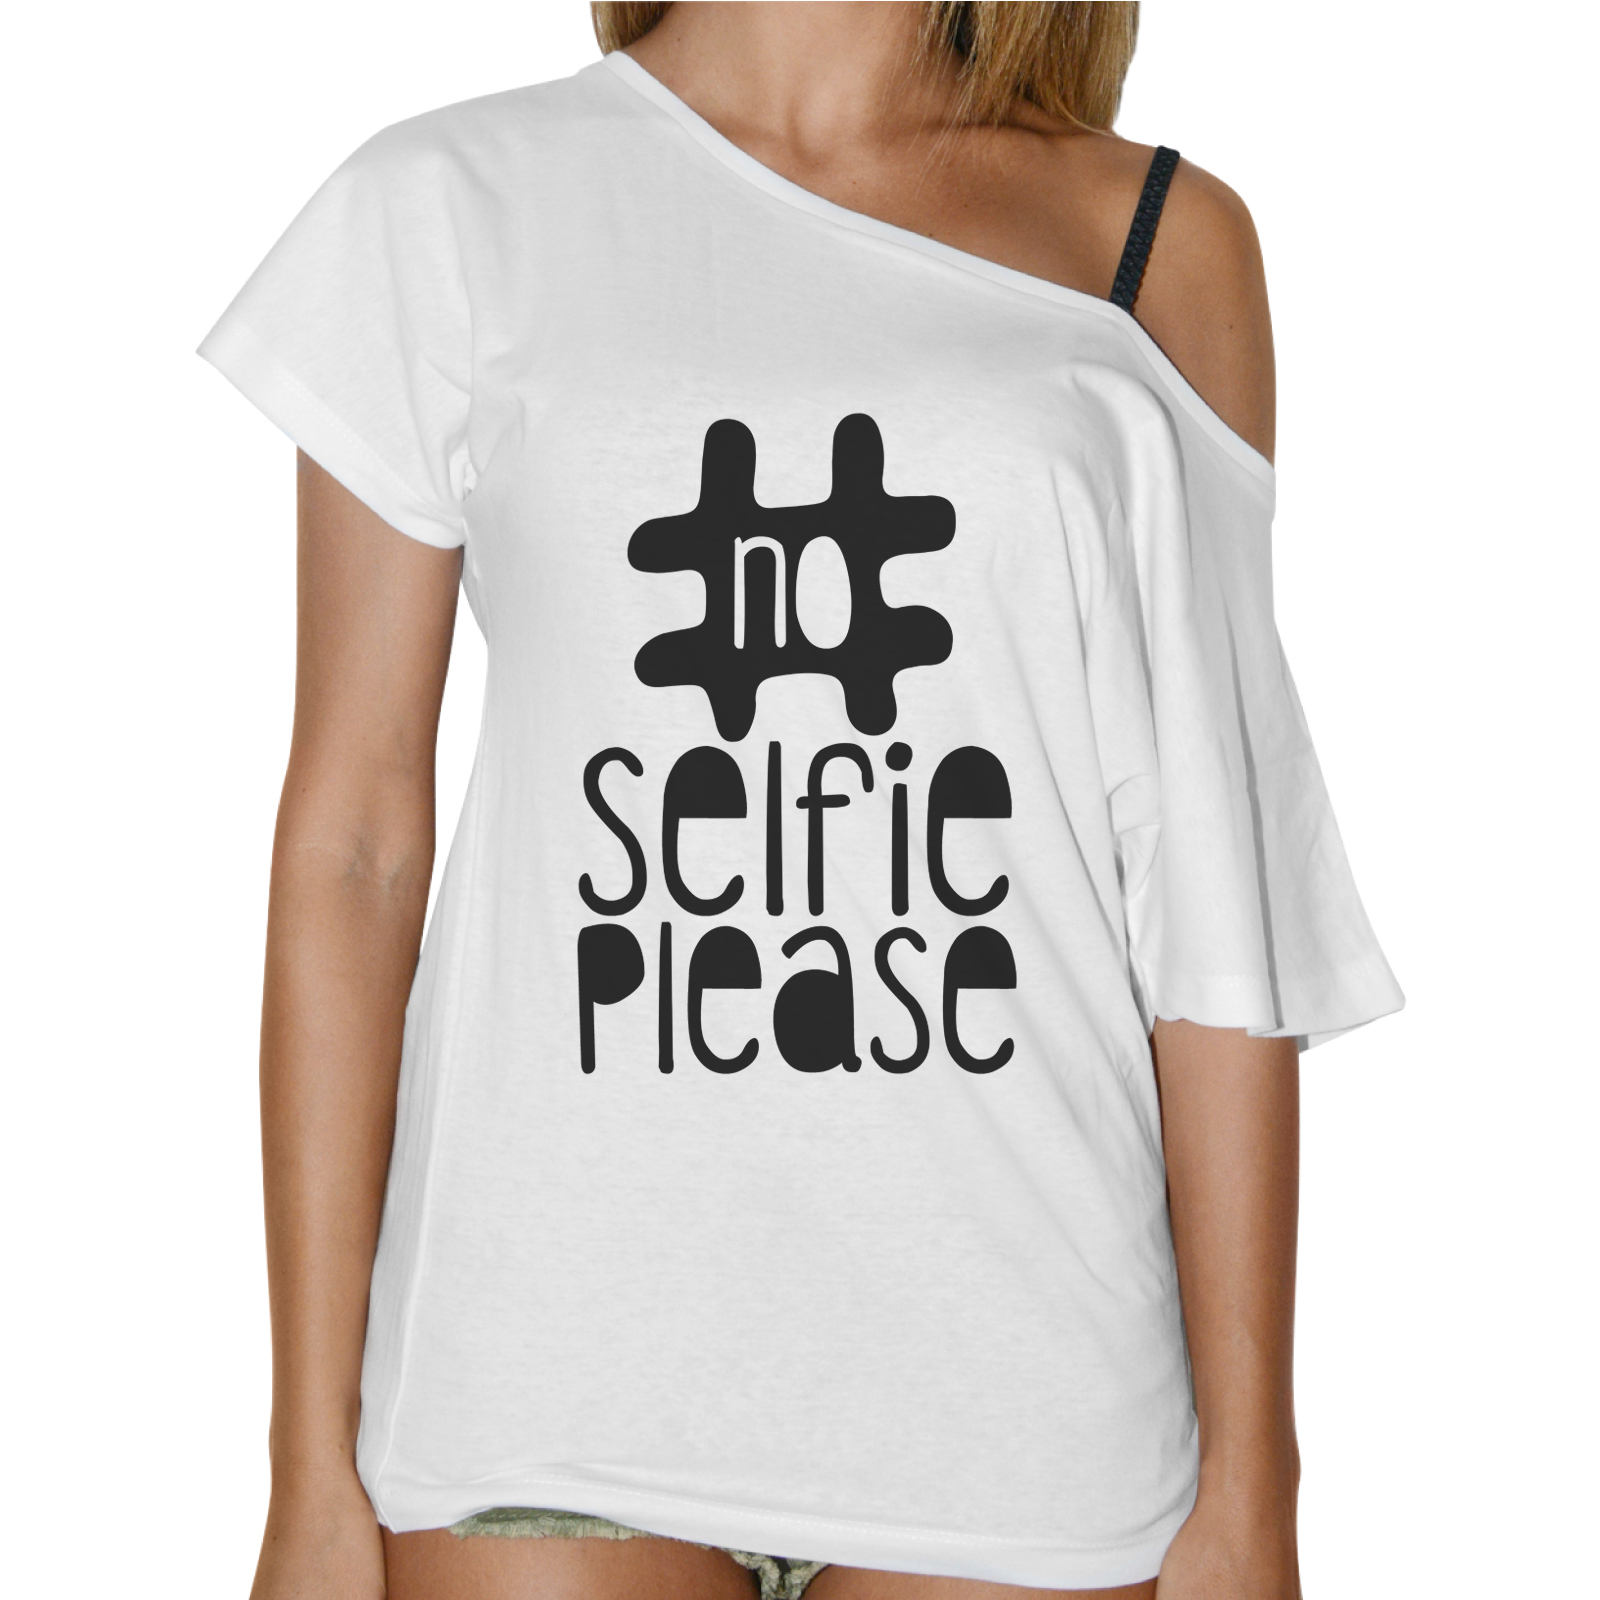 T-Shirt Donna Collo Barca NO SELFIE PLEASE